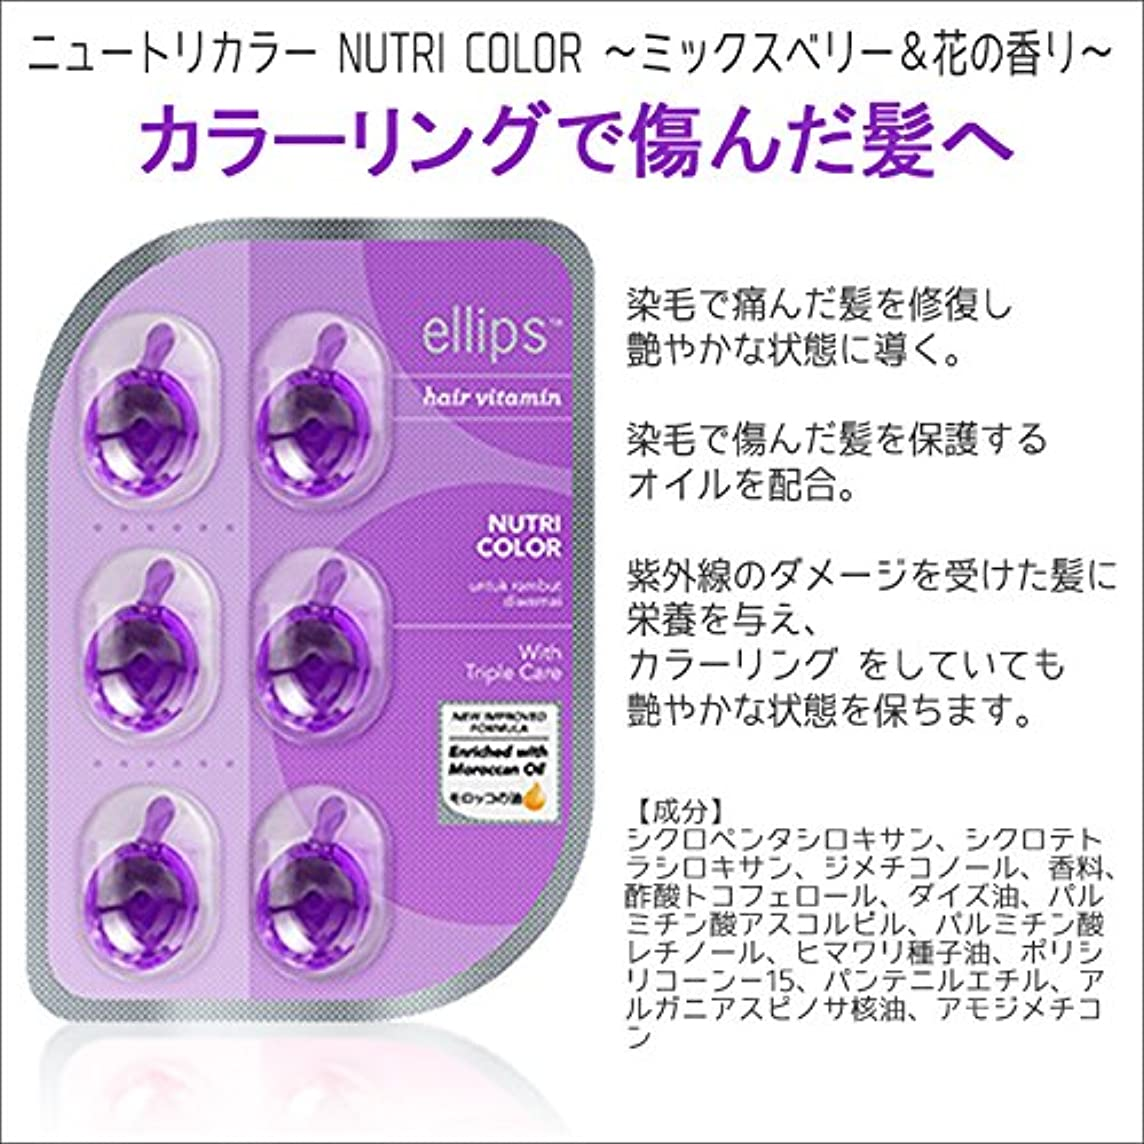 ellips Nutri Color (シートタイプ) クリアパープル